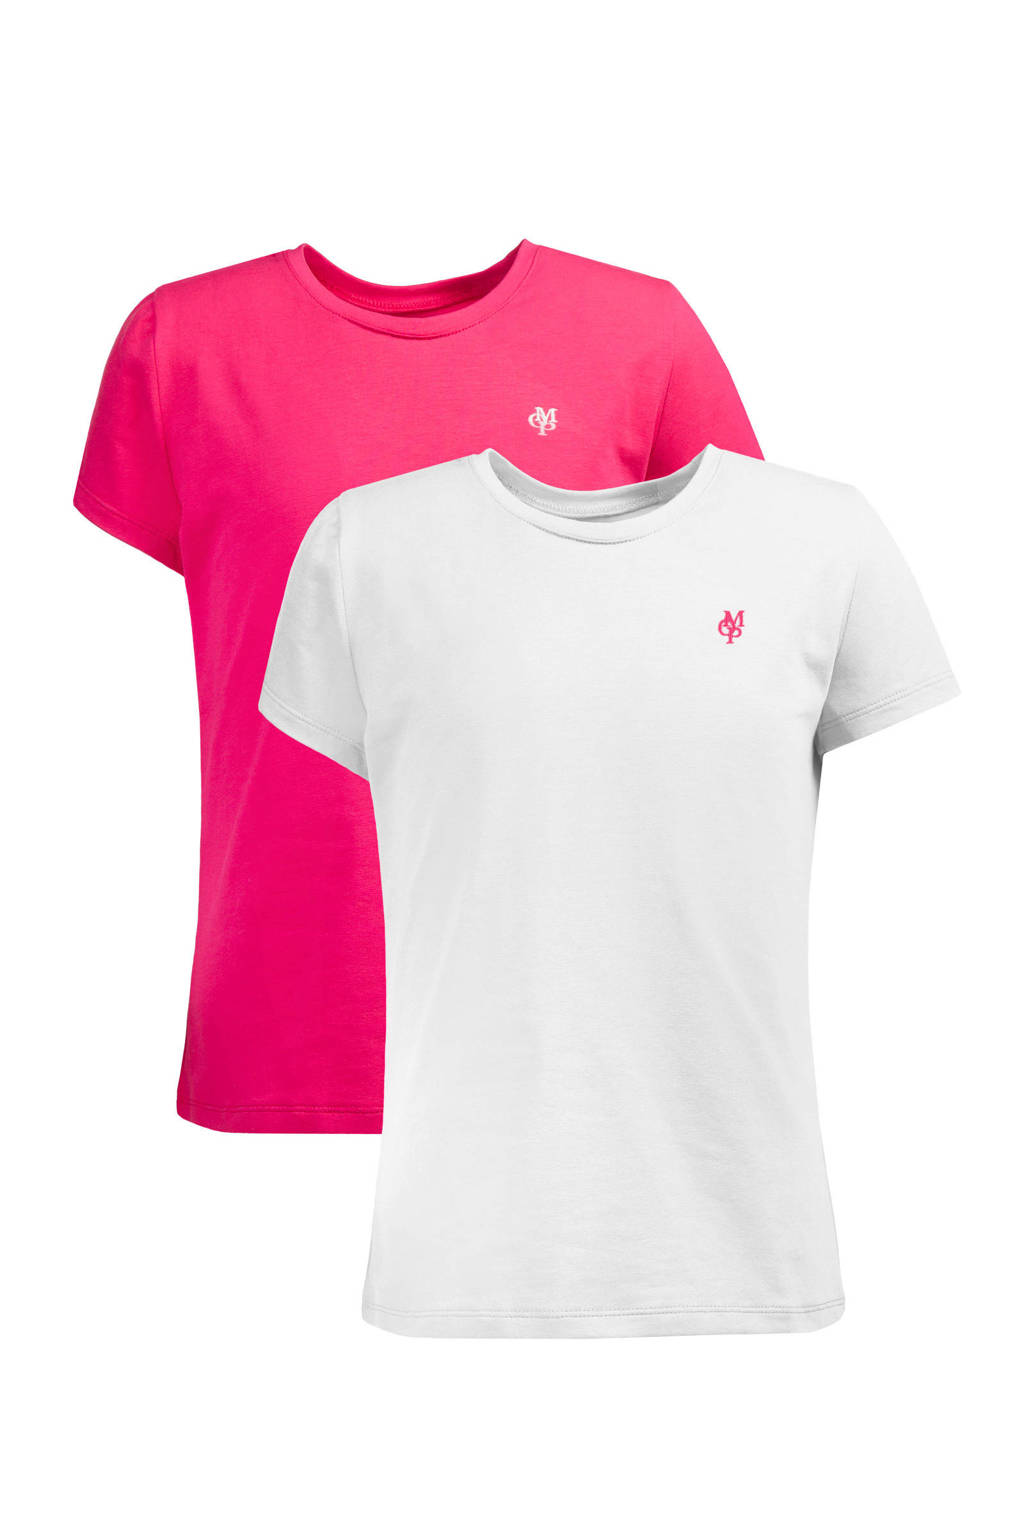 Marc O'Polo basic T-shirt fuchsia/wit, Fuchsia/wit